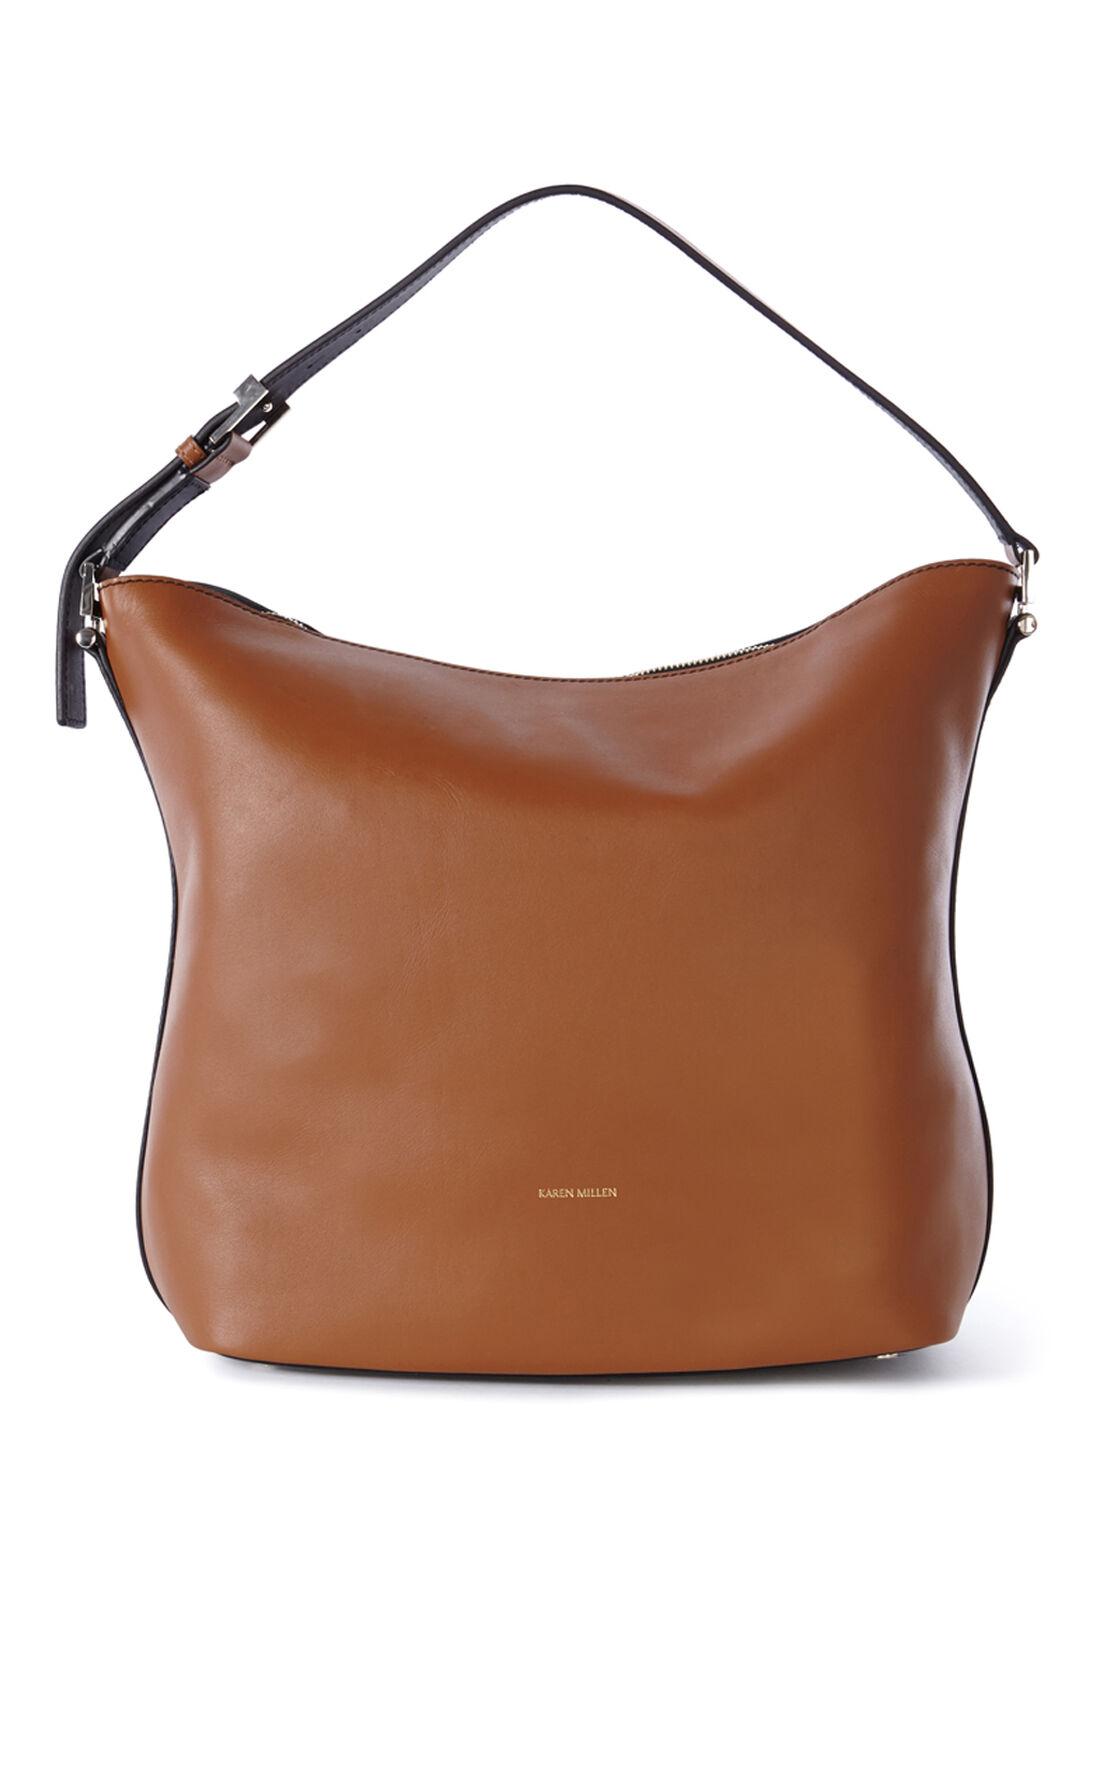 Karen Millen, BROWN LEATHER SLING BAG Multi 0